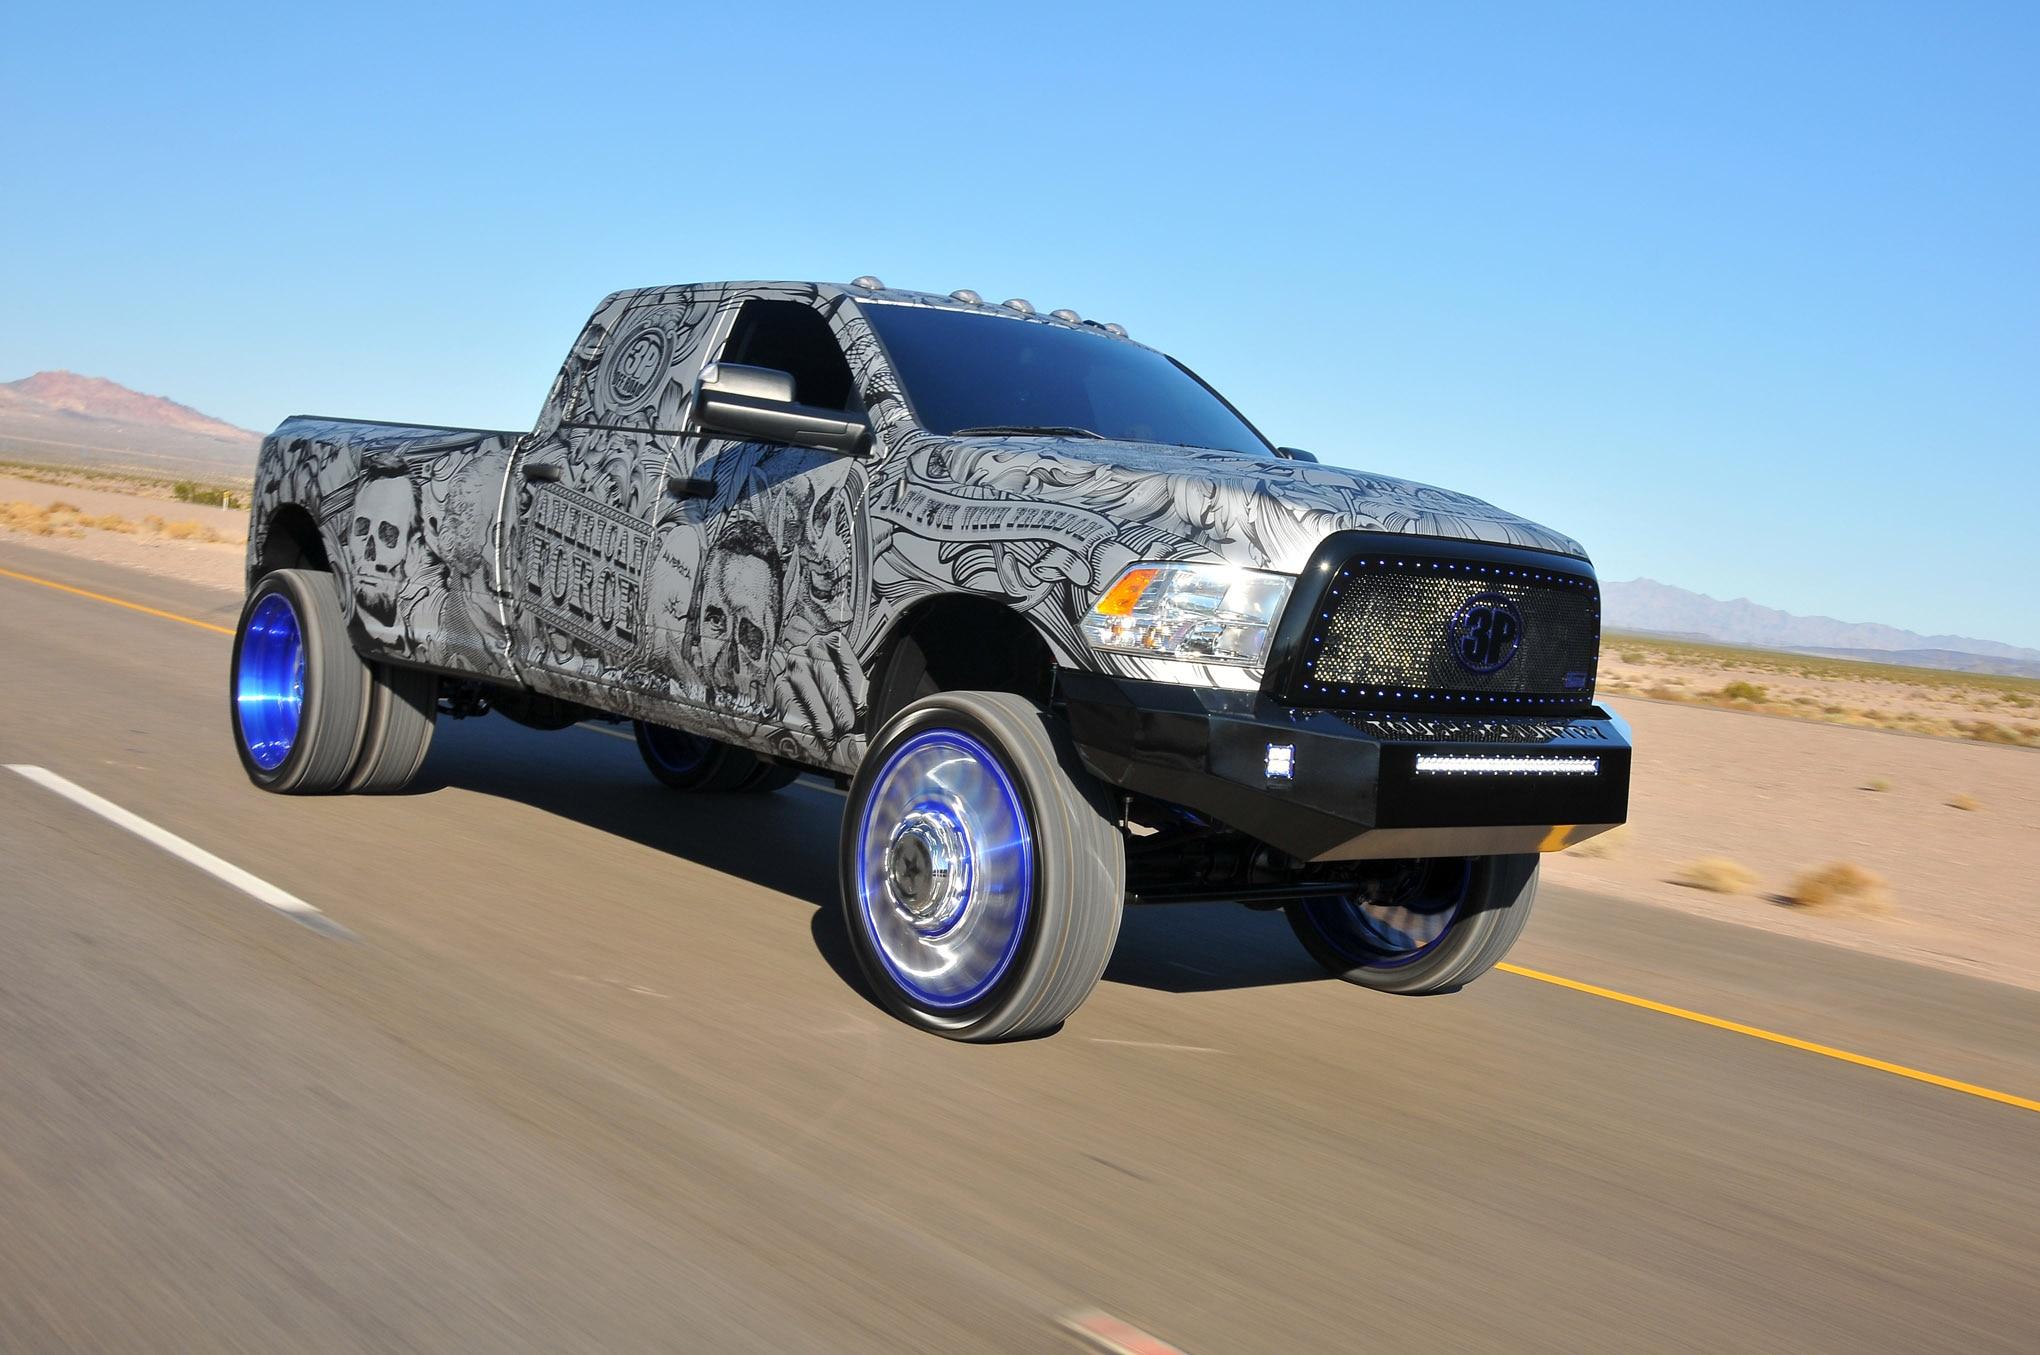 2015 Dodge Truck >> 2015 Dodge Ram 3500 Tow Truck Show Truck